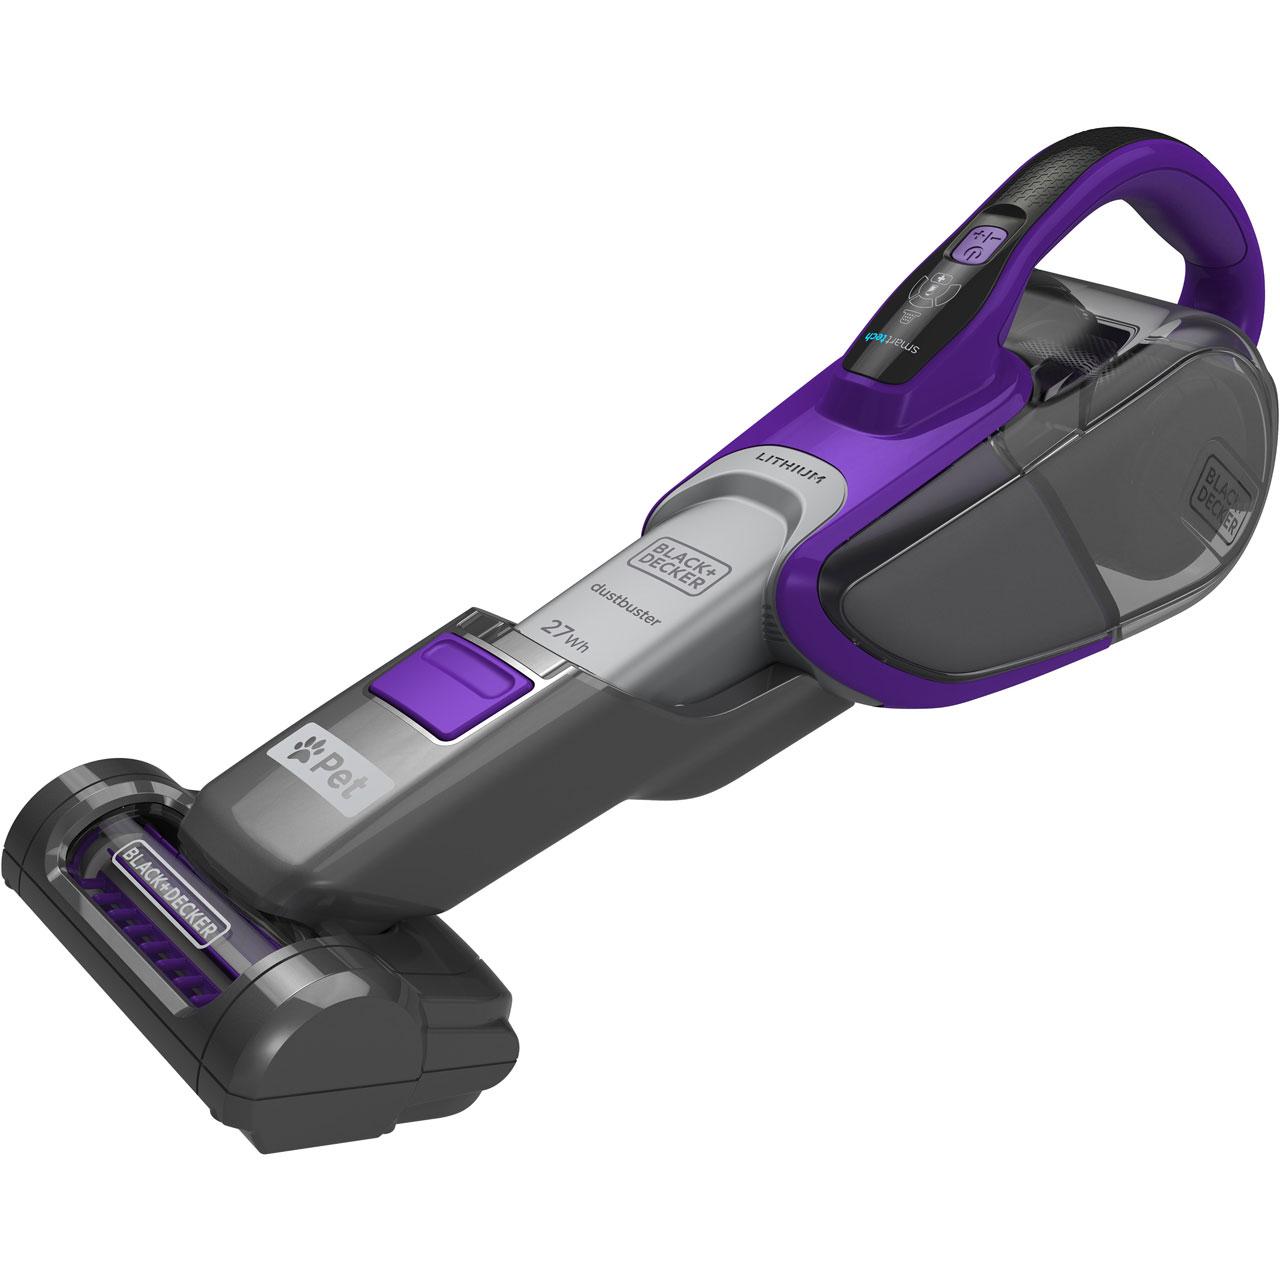 Black & Decker Pet Range DVJ325BFSP-GB Handheld Vacuum £62.10 @ AO.com